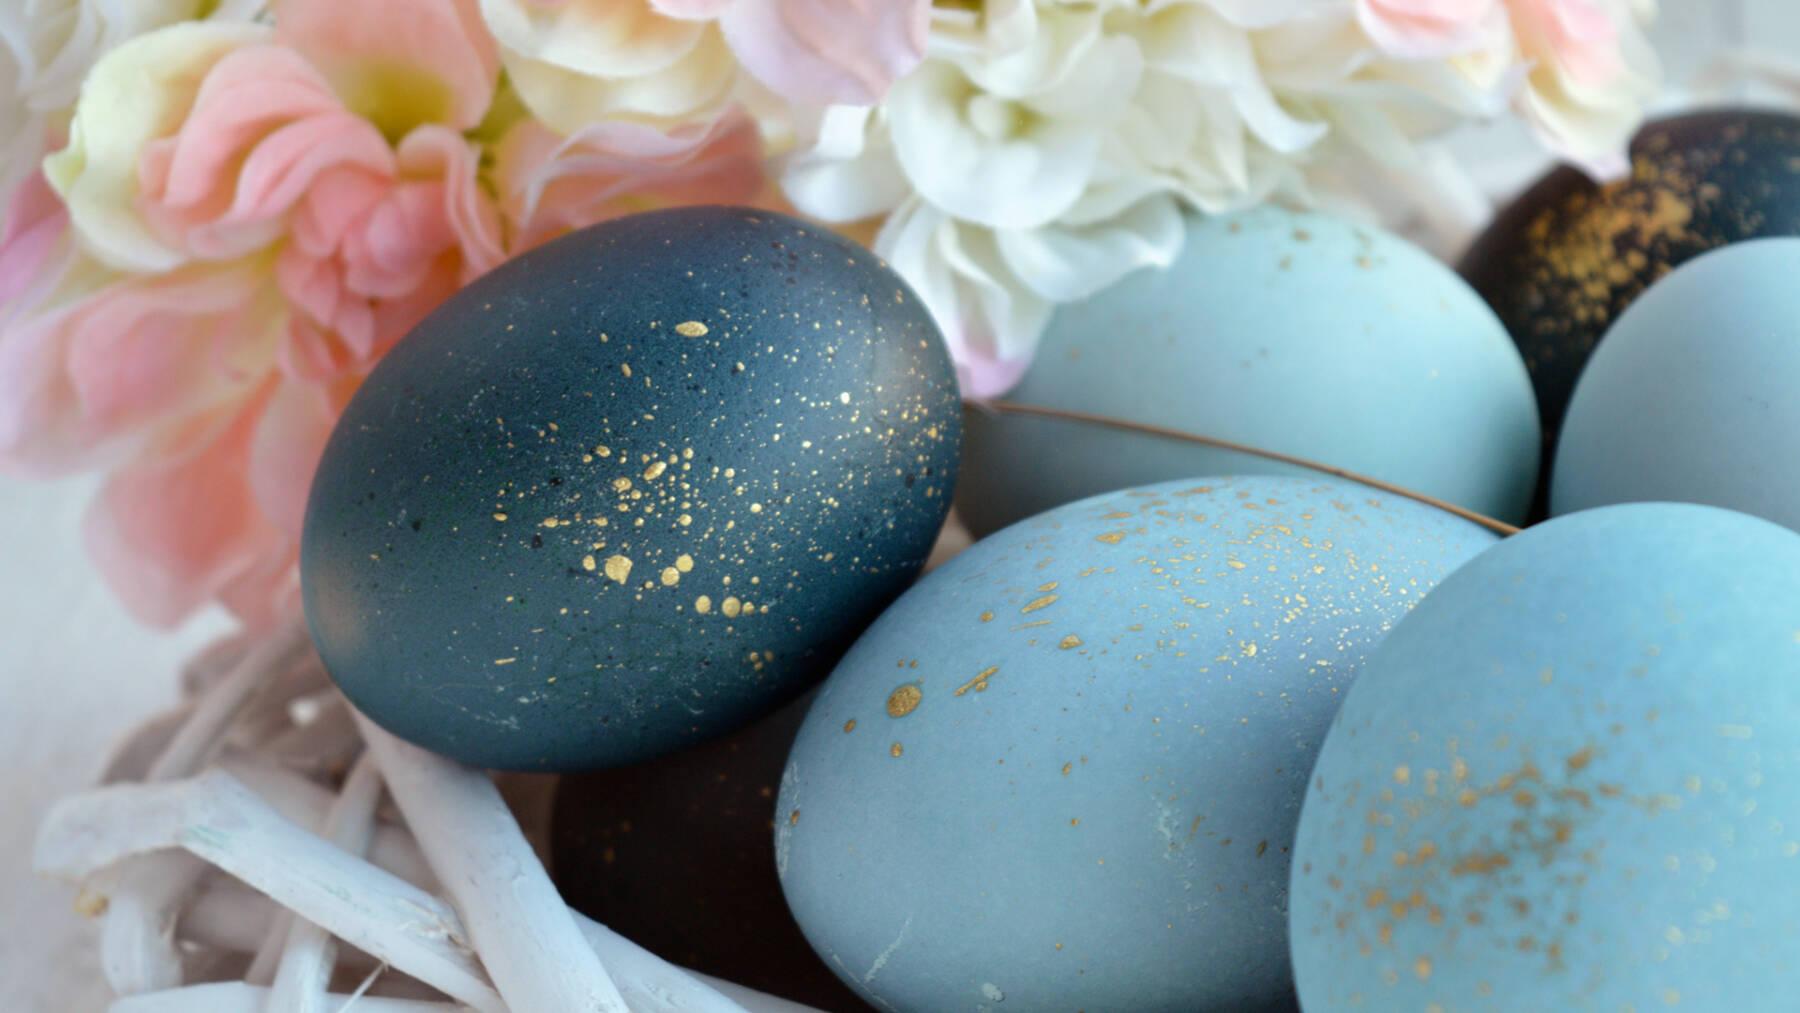 Uova sode decorate, uova decorate, diy pasqua, diy easter, craft, centrotavola di pasqua, decorazioni di pasqua, idee di pasqua, easter decorations, easter centerpiece